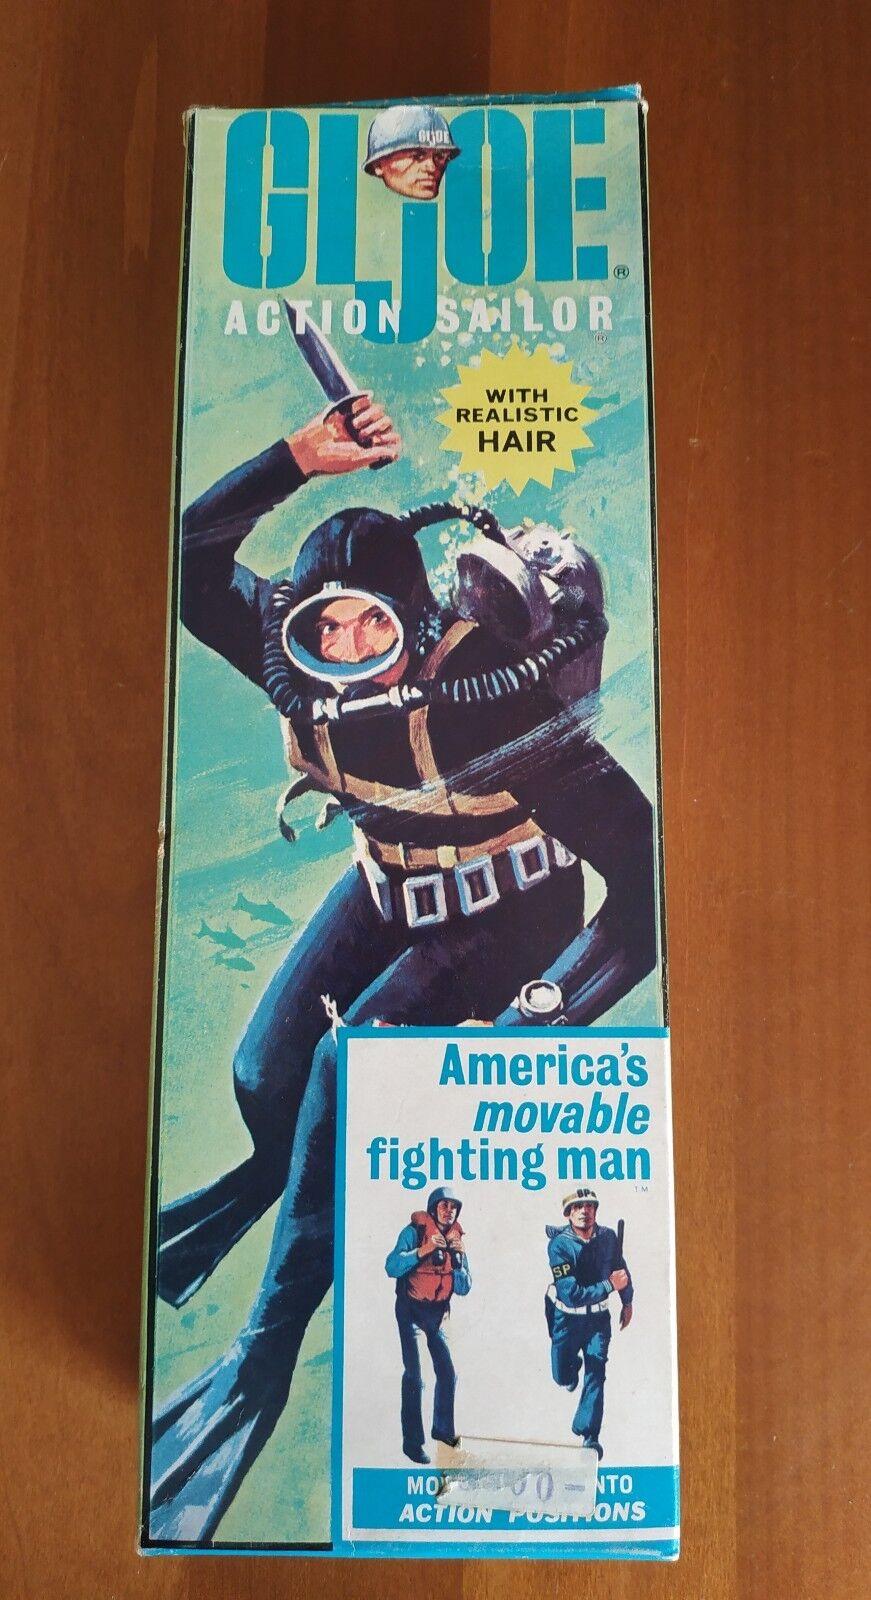 Gi Joe Action Sailor 1964 ACTION MAN Originale RARO Hasbro with Realistic Hair